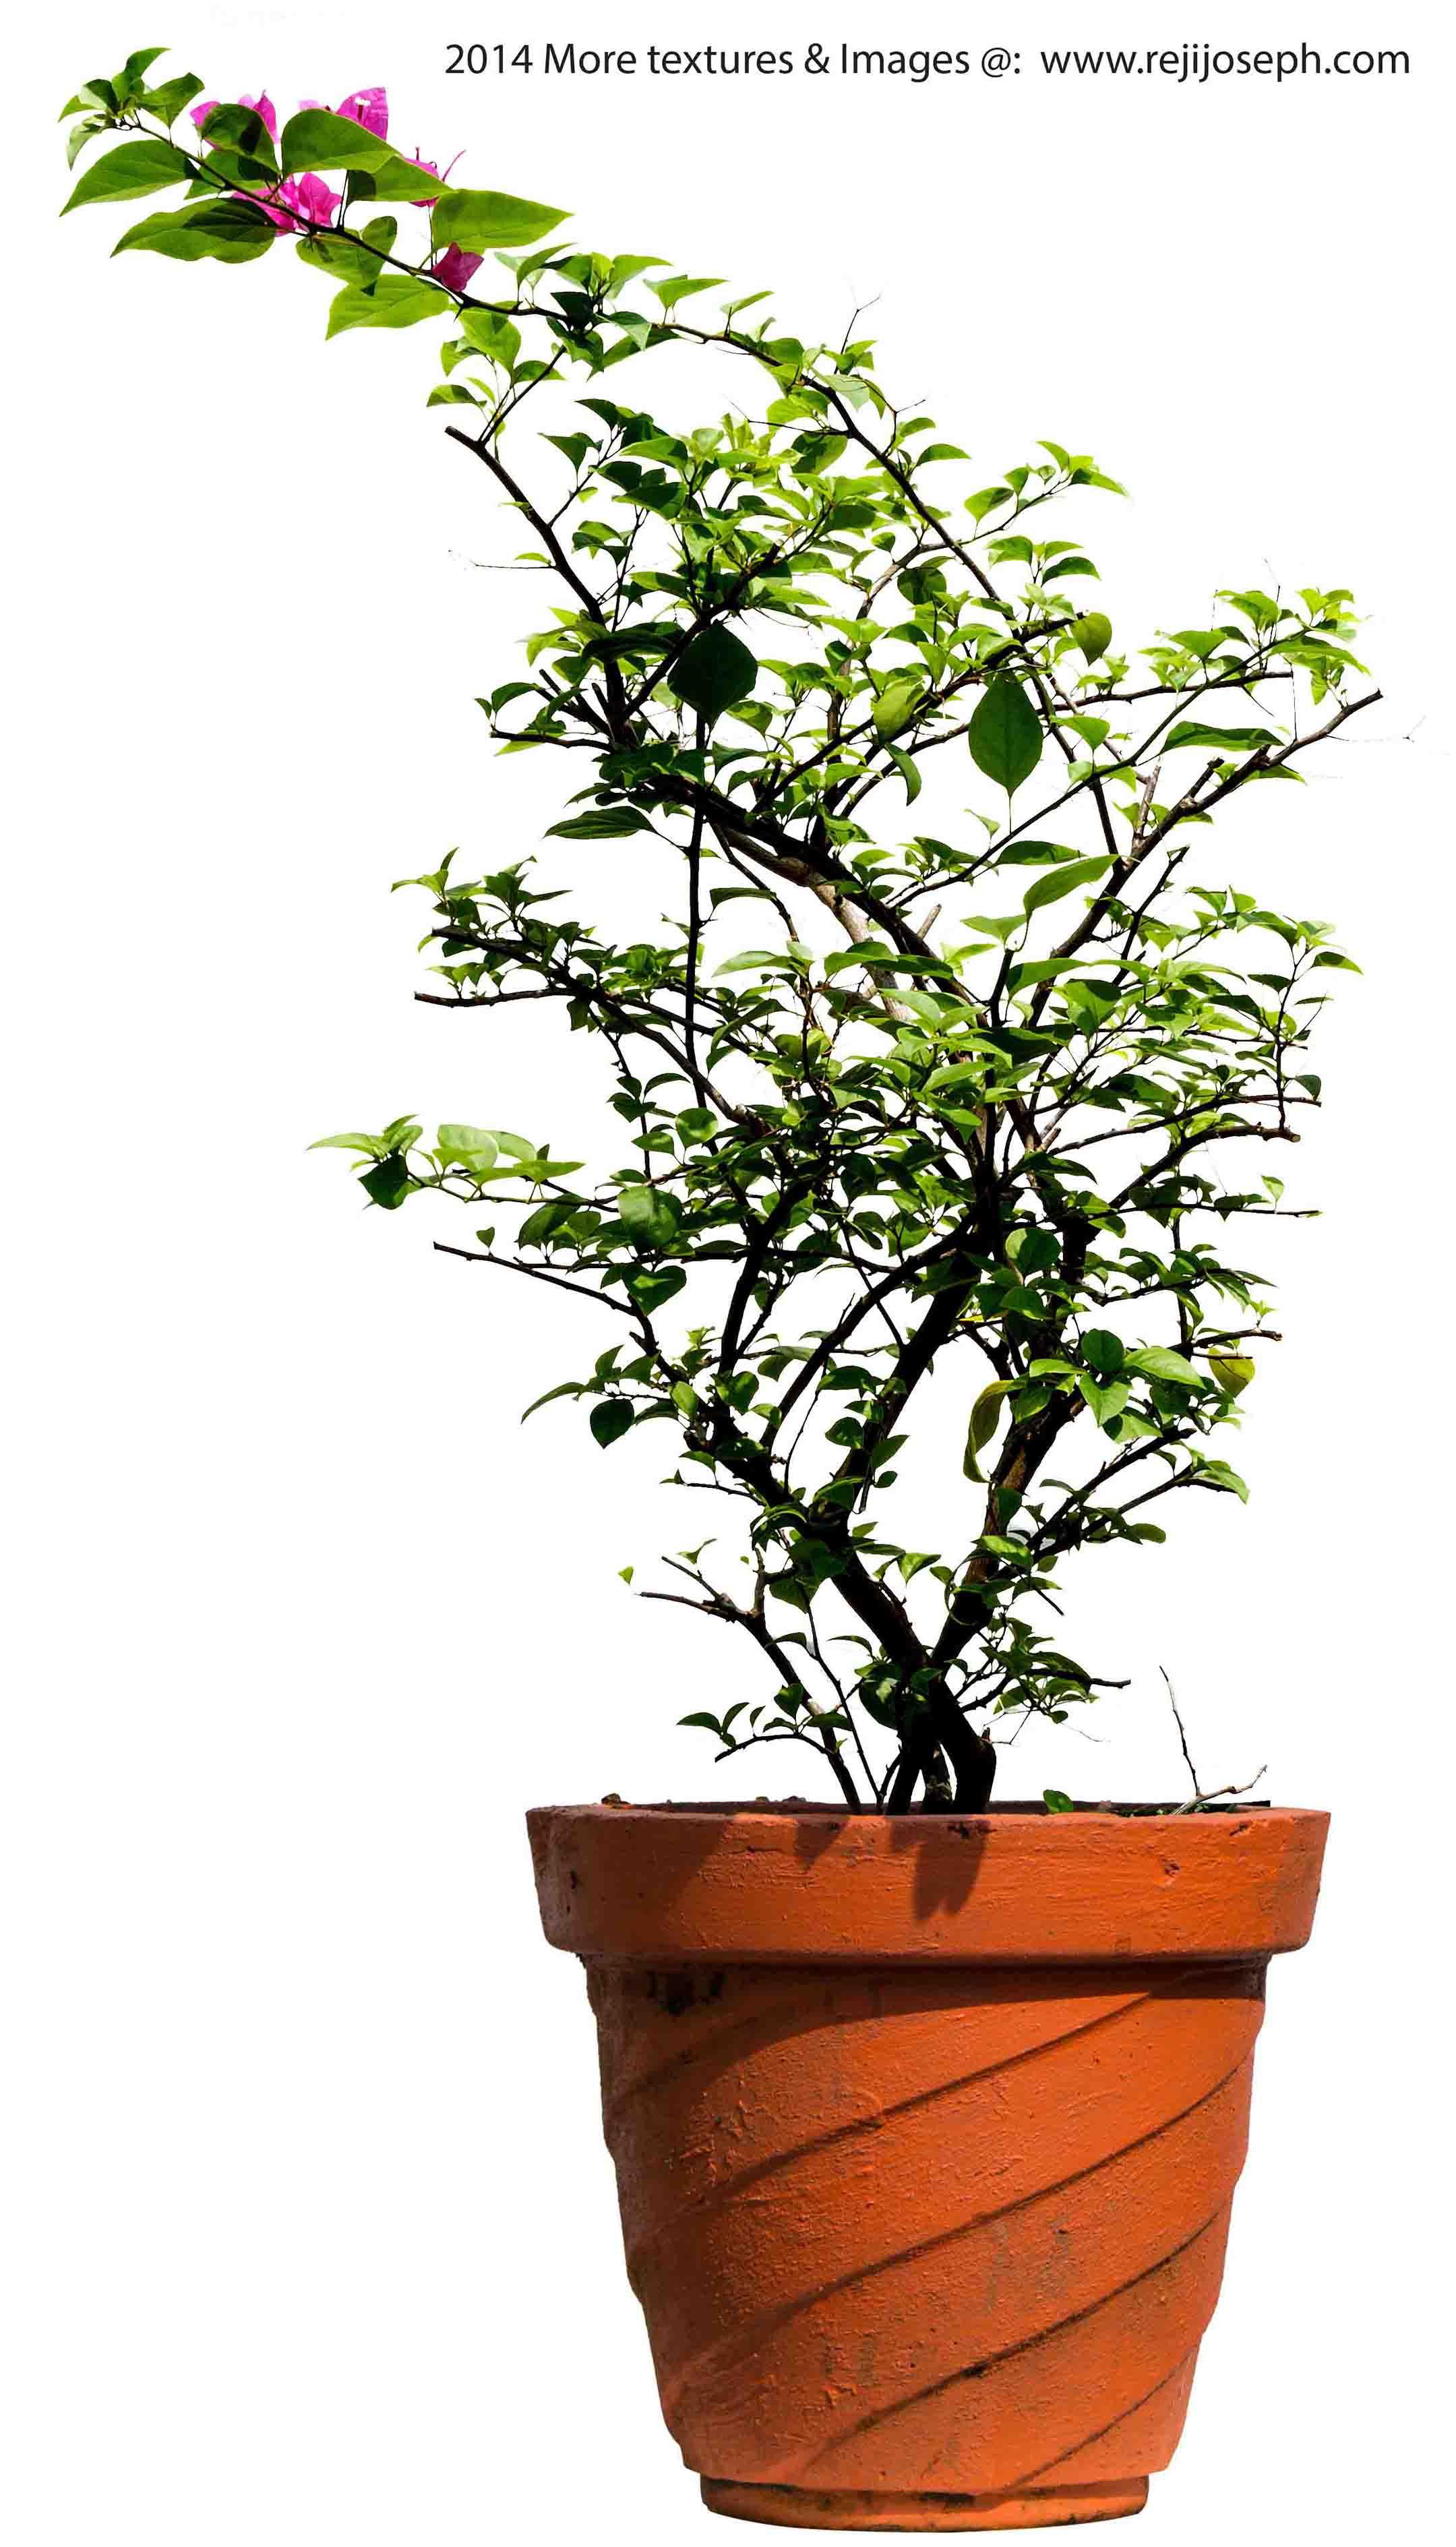 Bougainvillea Garden Plant Texture 00004